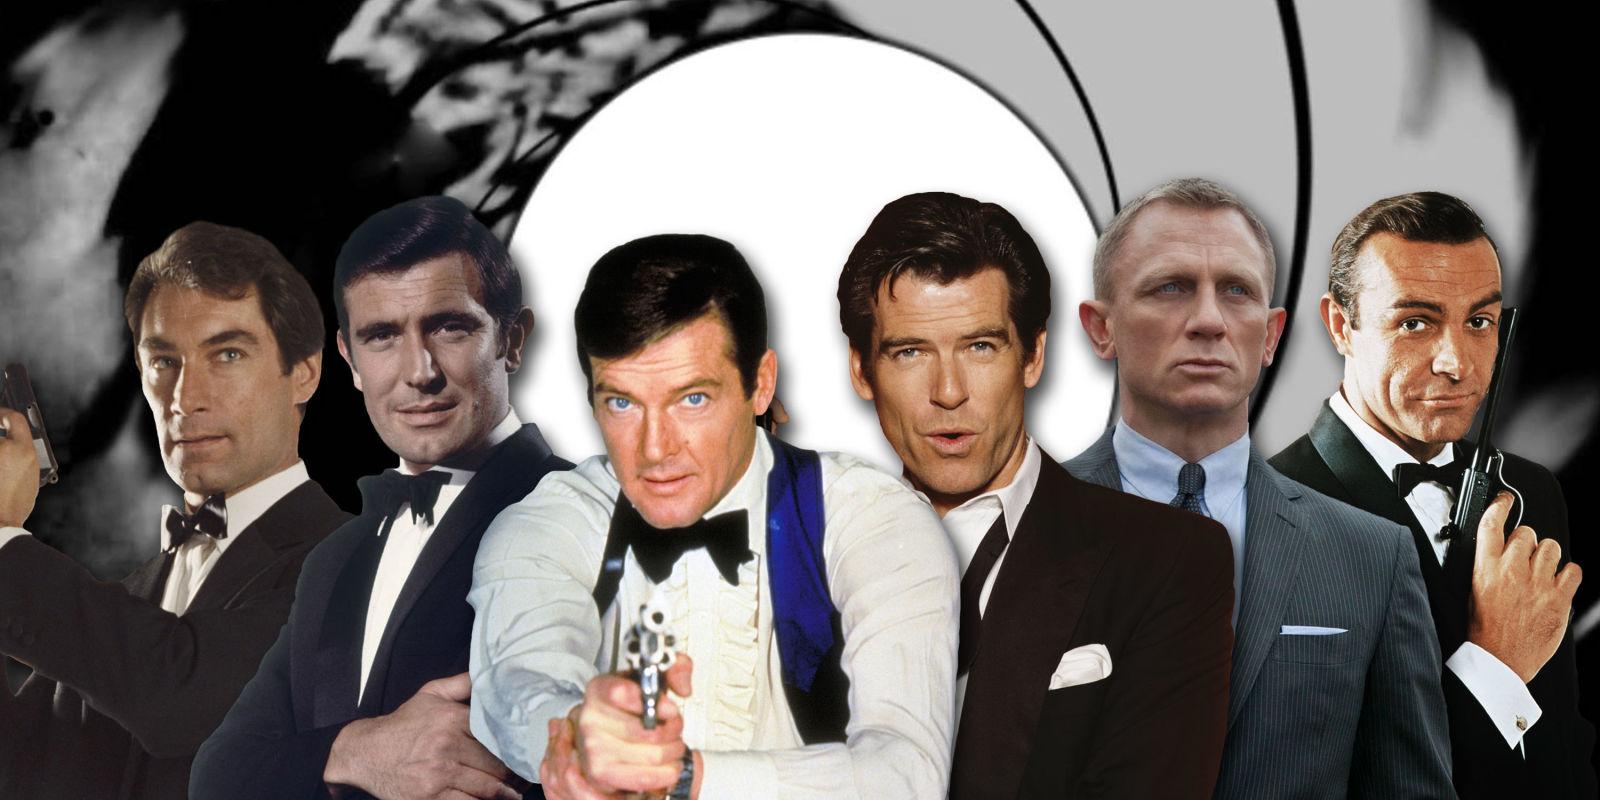 james bond actors ranked who wore the tux best